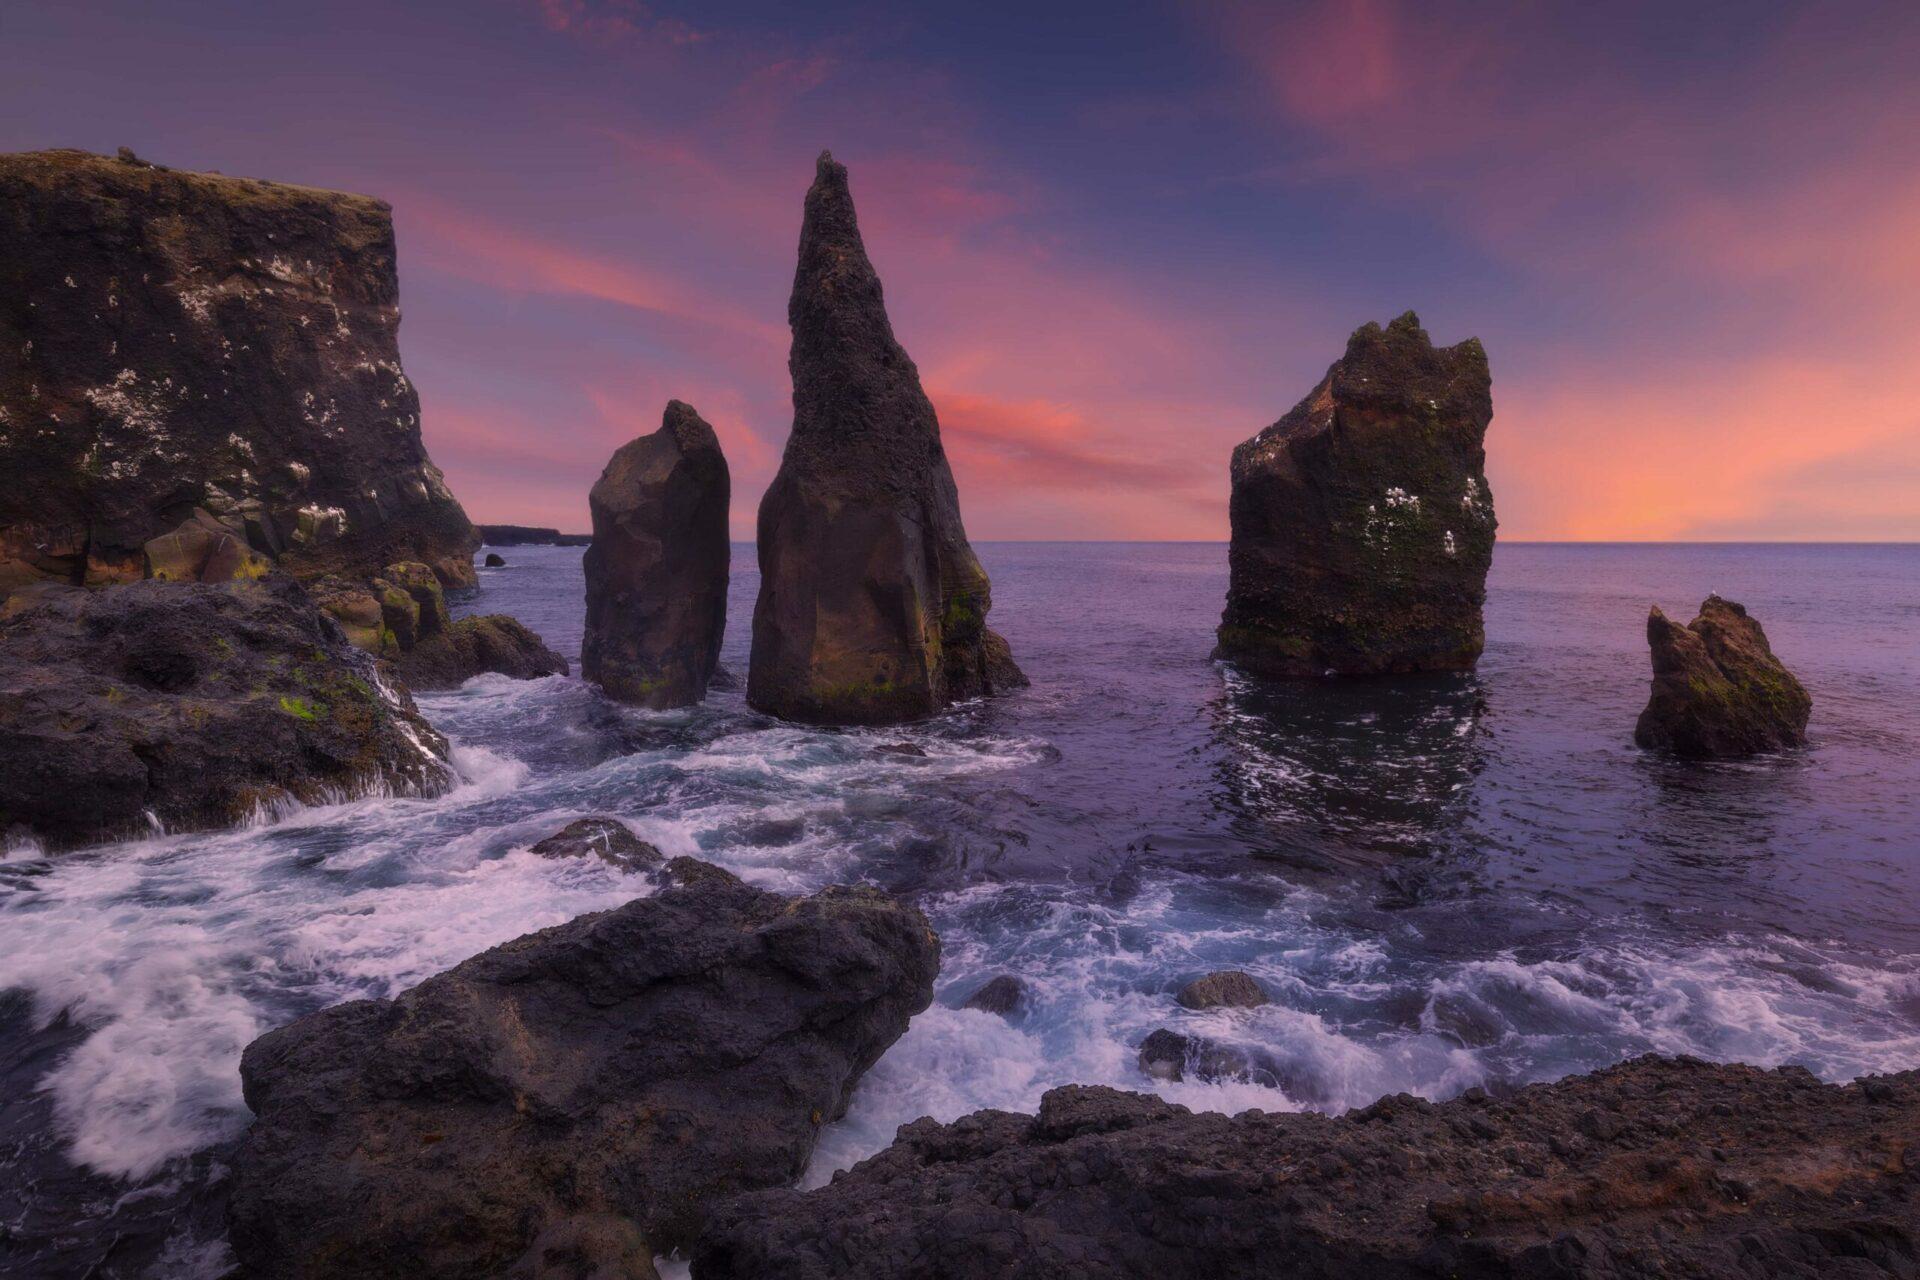 Reykjanestá: A Picturesque Landscape in Iceland